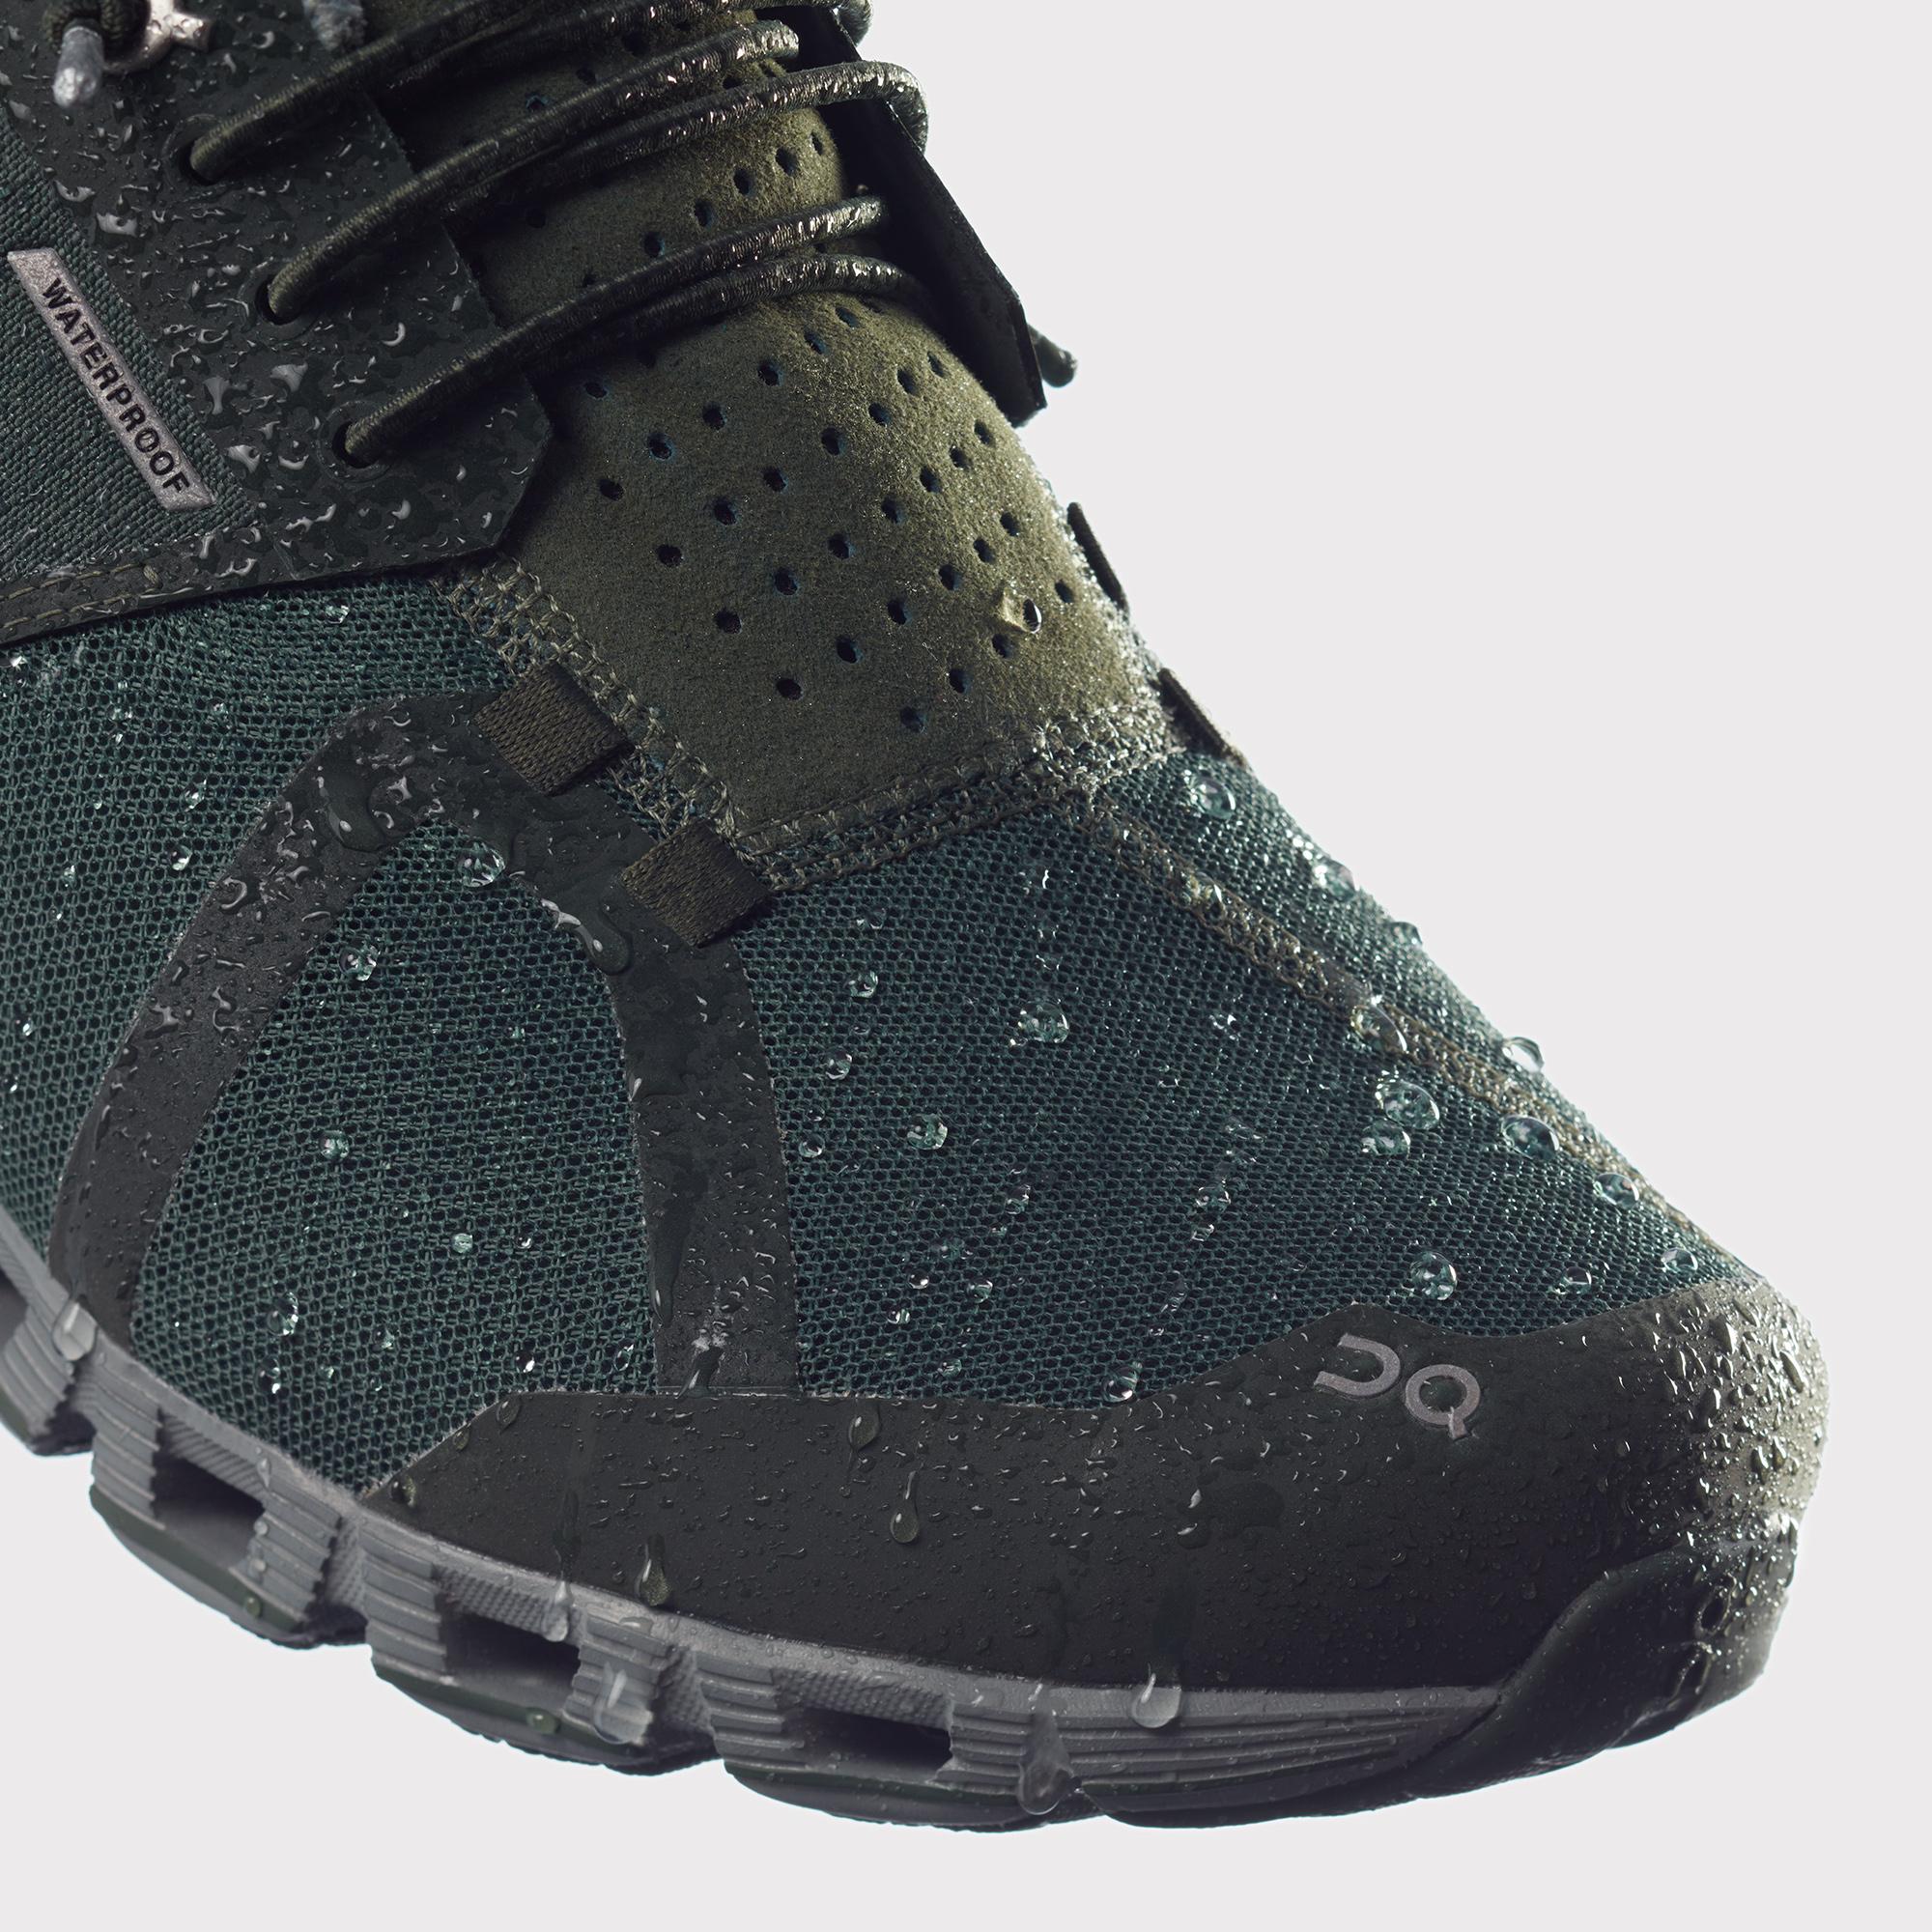 Lightweight Waterproof Running Shoe